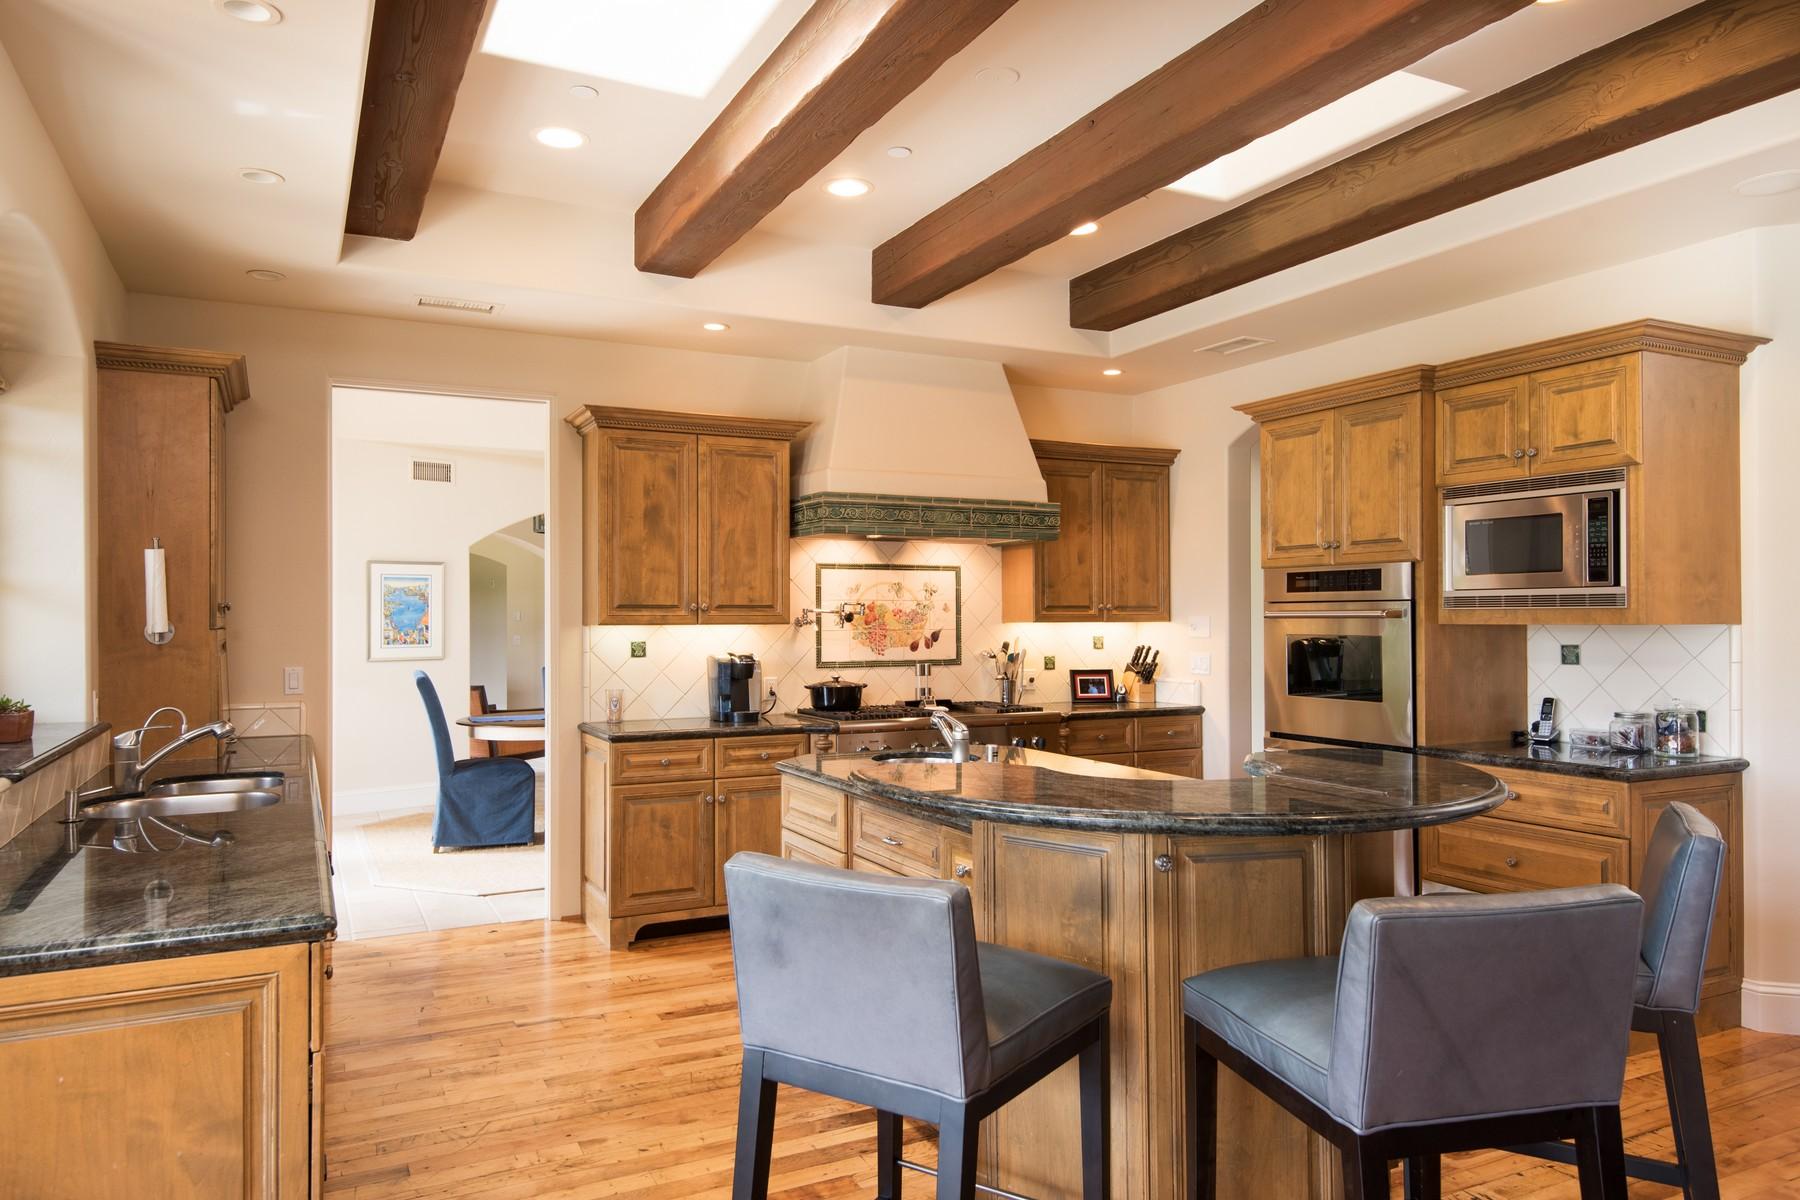 Additional photo for property listing at San Elijo 5546 San Elijo Rancho Santa Fe, 加利福尼亚州 92067 美国